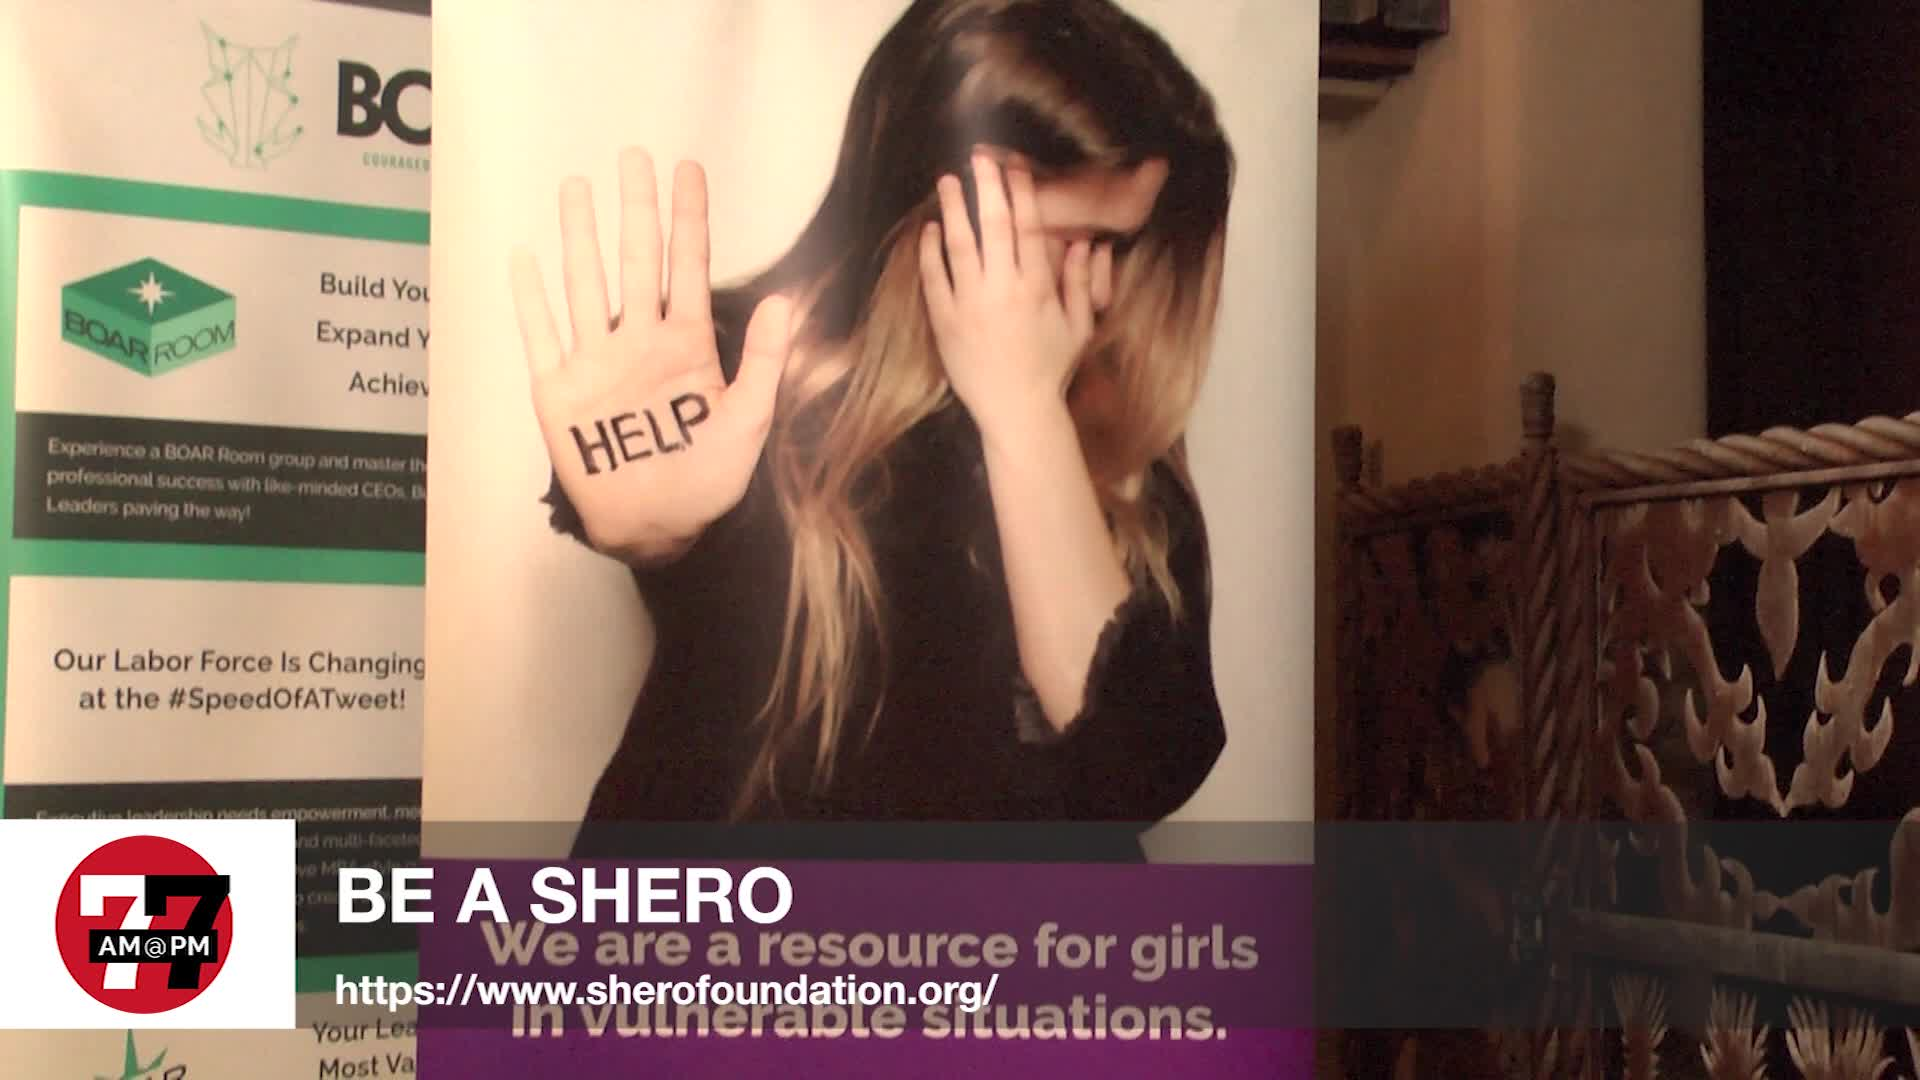 7@7PM Be a Shero